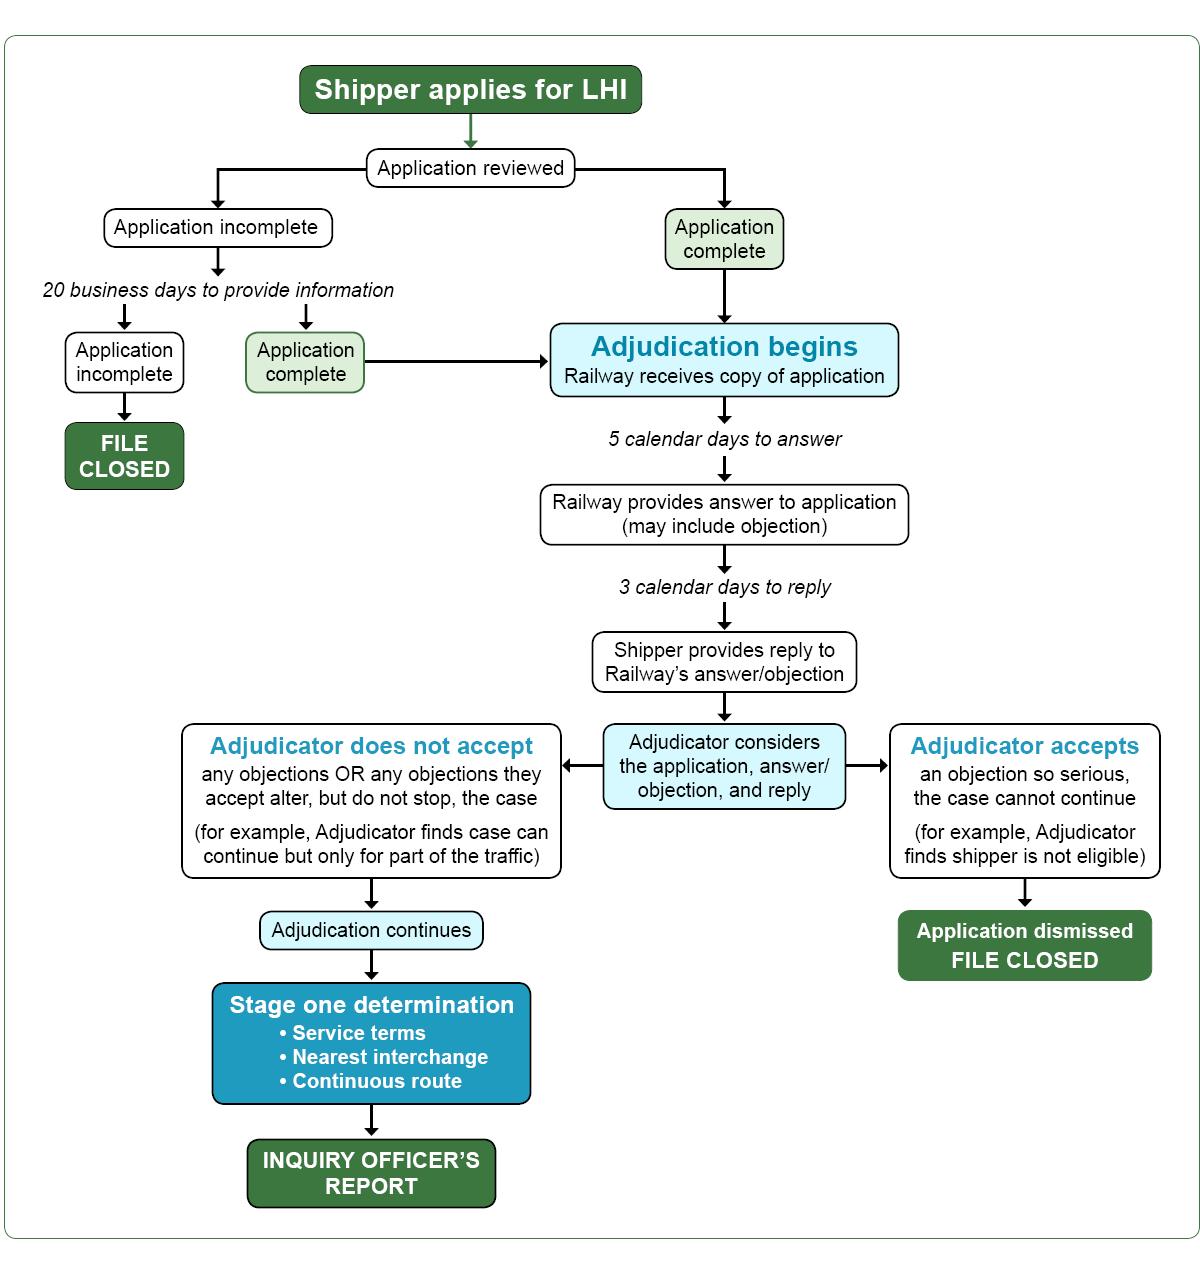 LHI application and adjudication, Stage 1